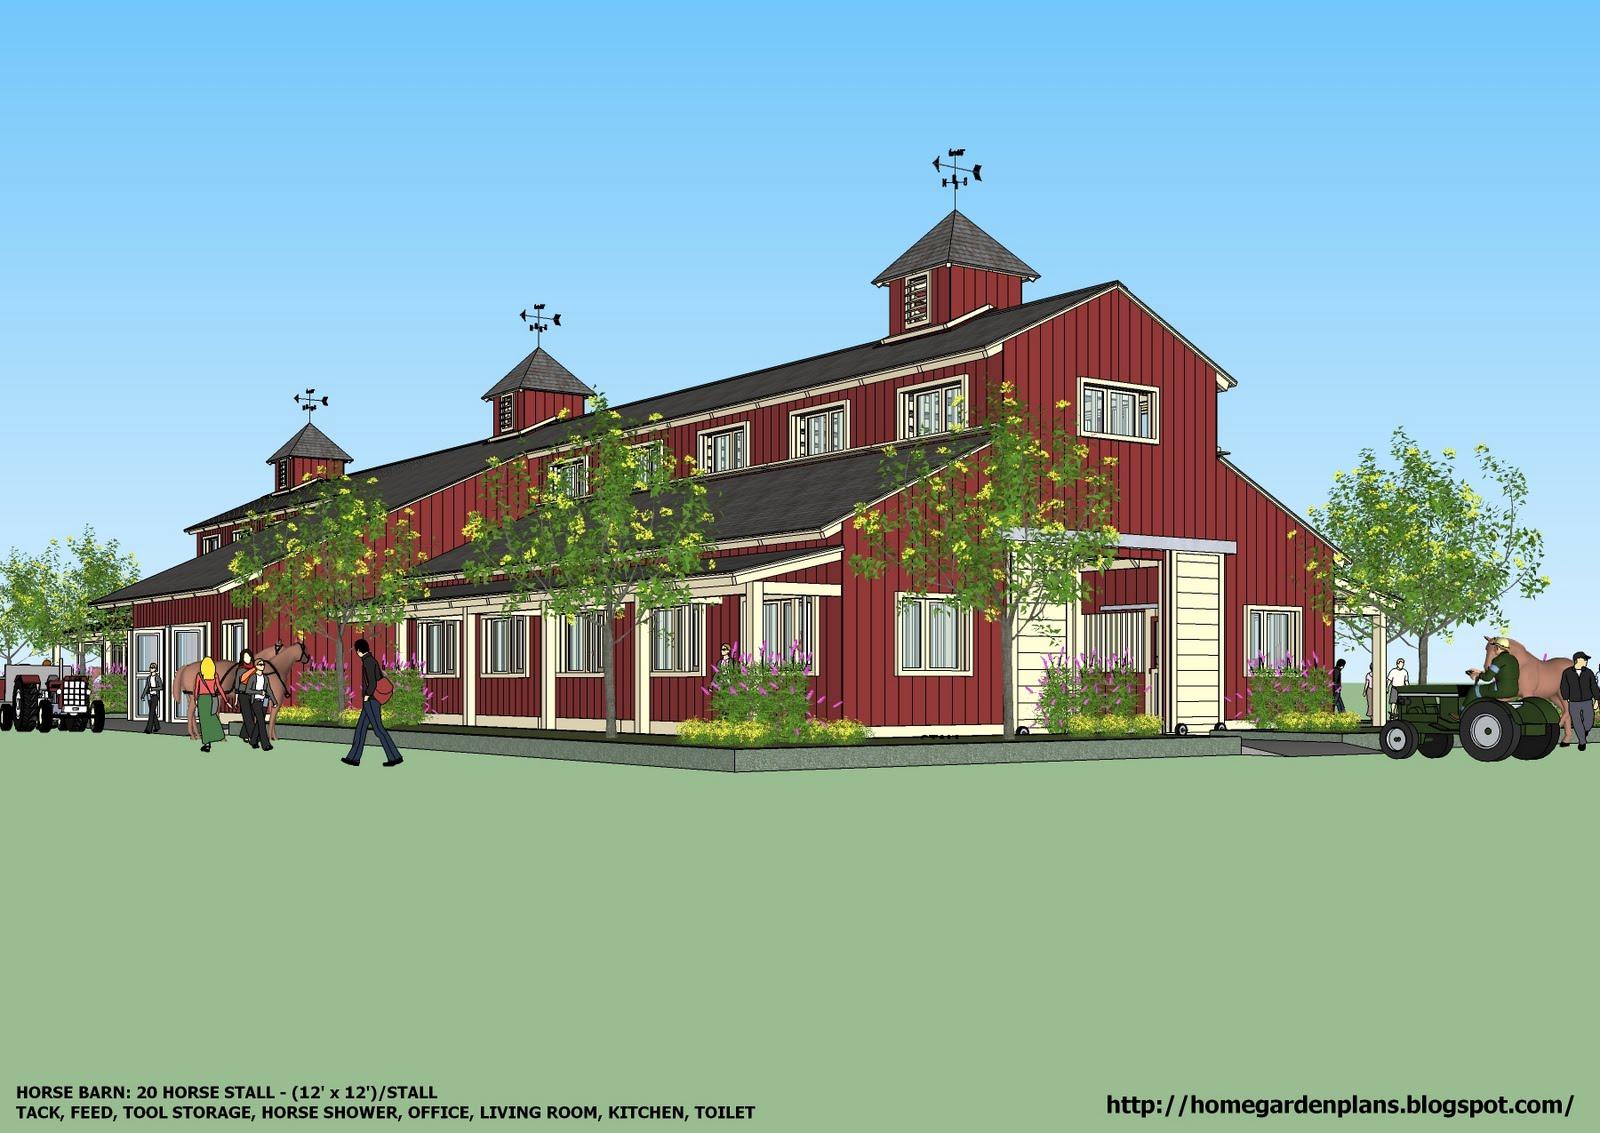 Home Garden Plans B20h Large Horse Barn For 20 Horse